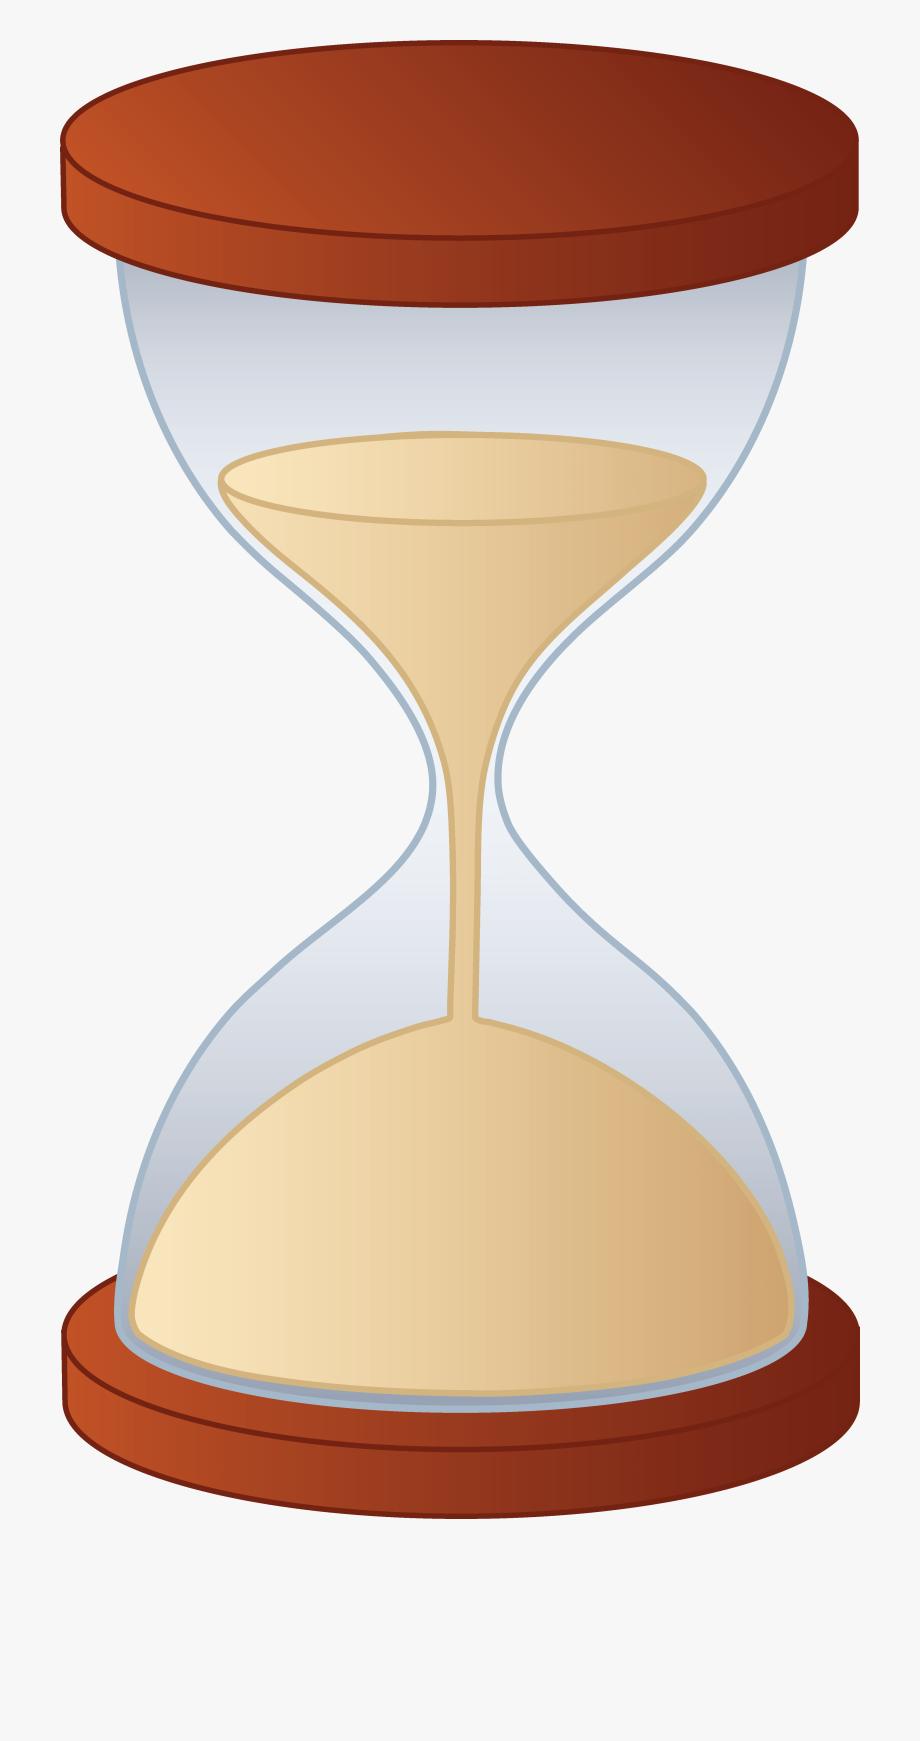 clip art transparent download Download cartoon free . Hourglass clipart transparent background.